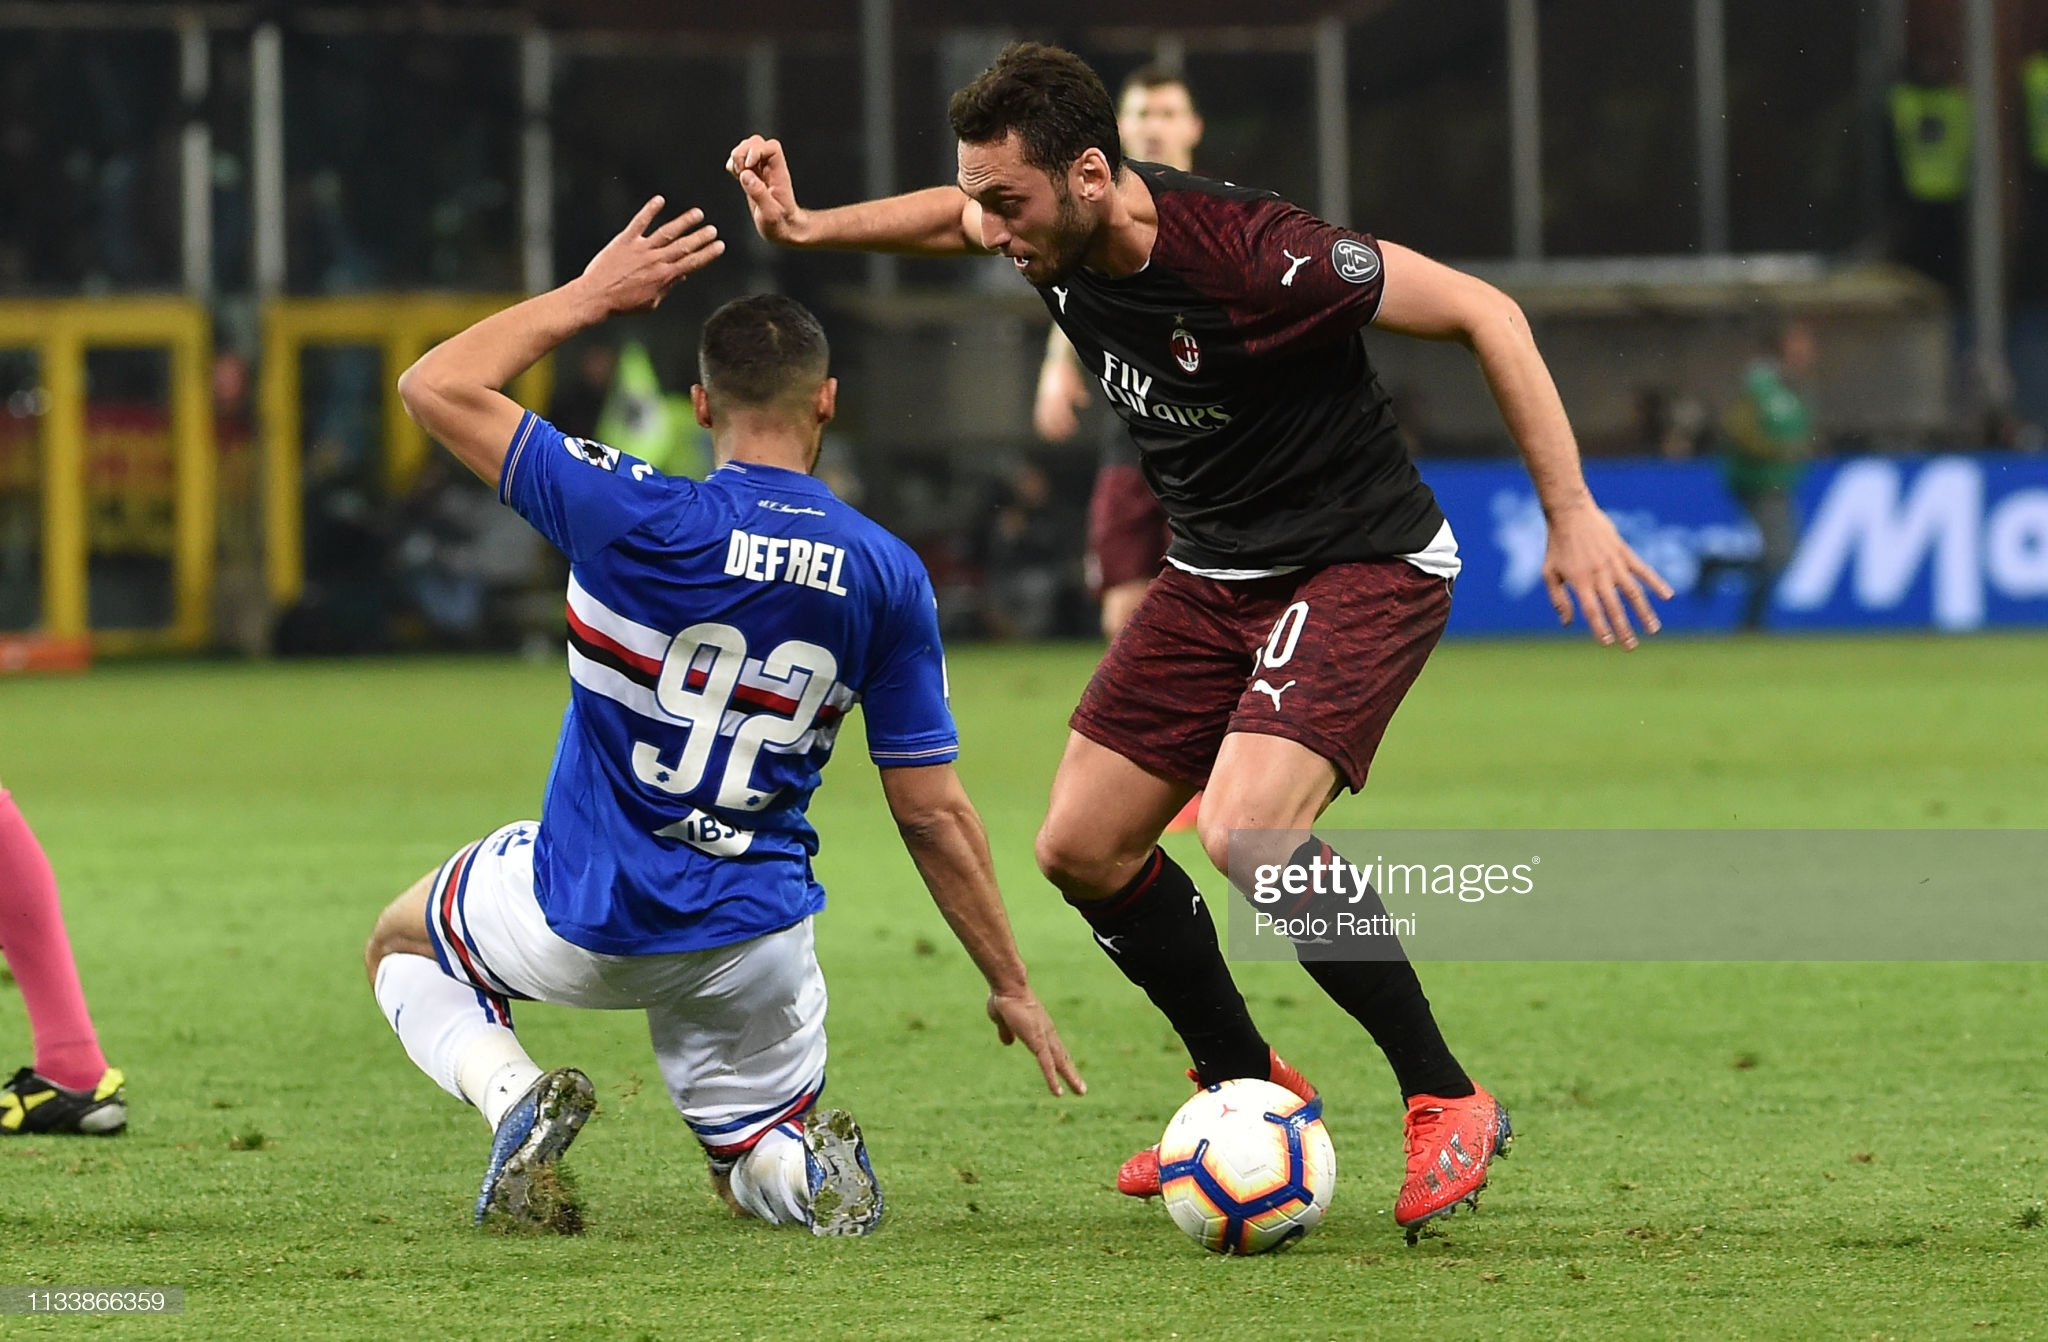 AC Milan v Sampdoria preview, prediction and odds